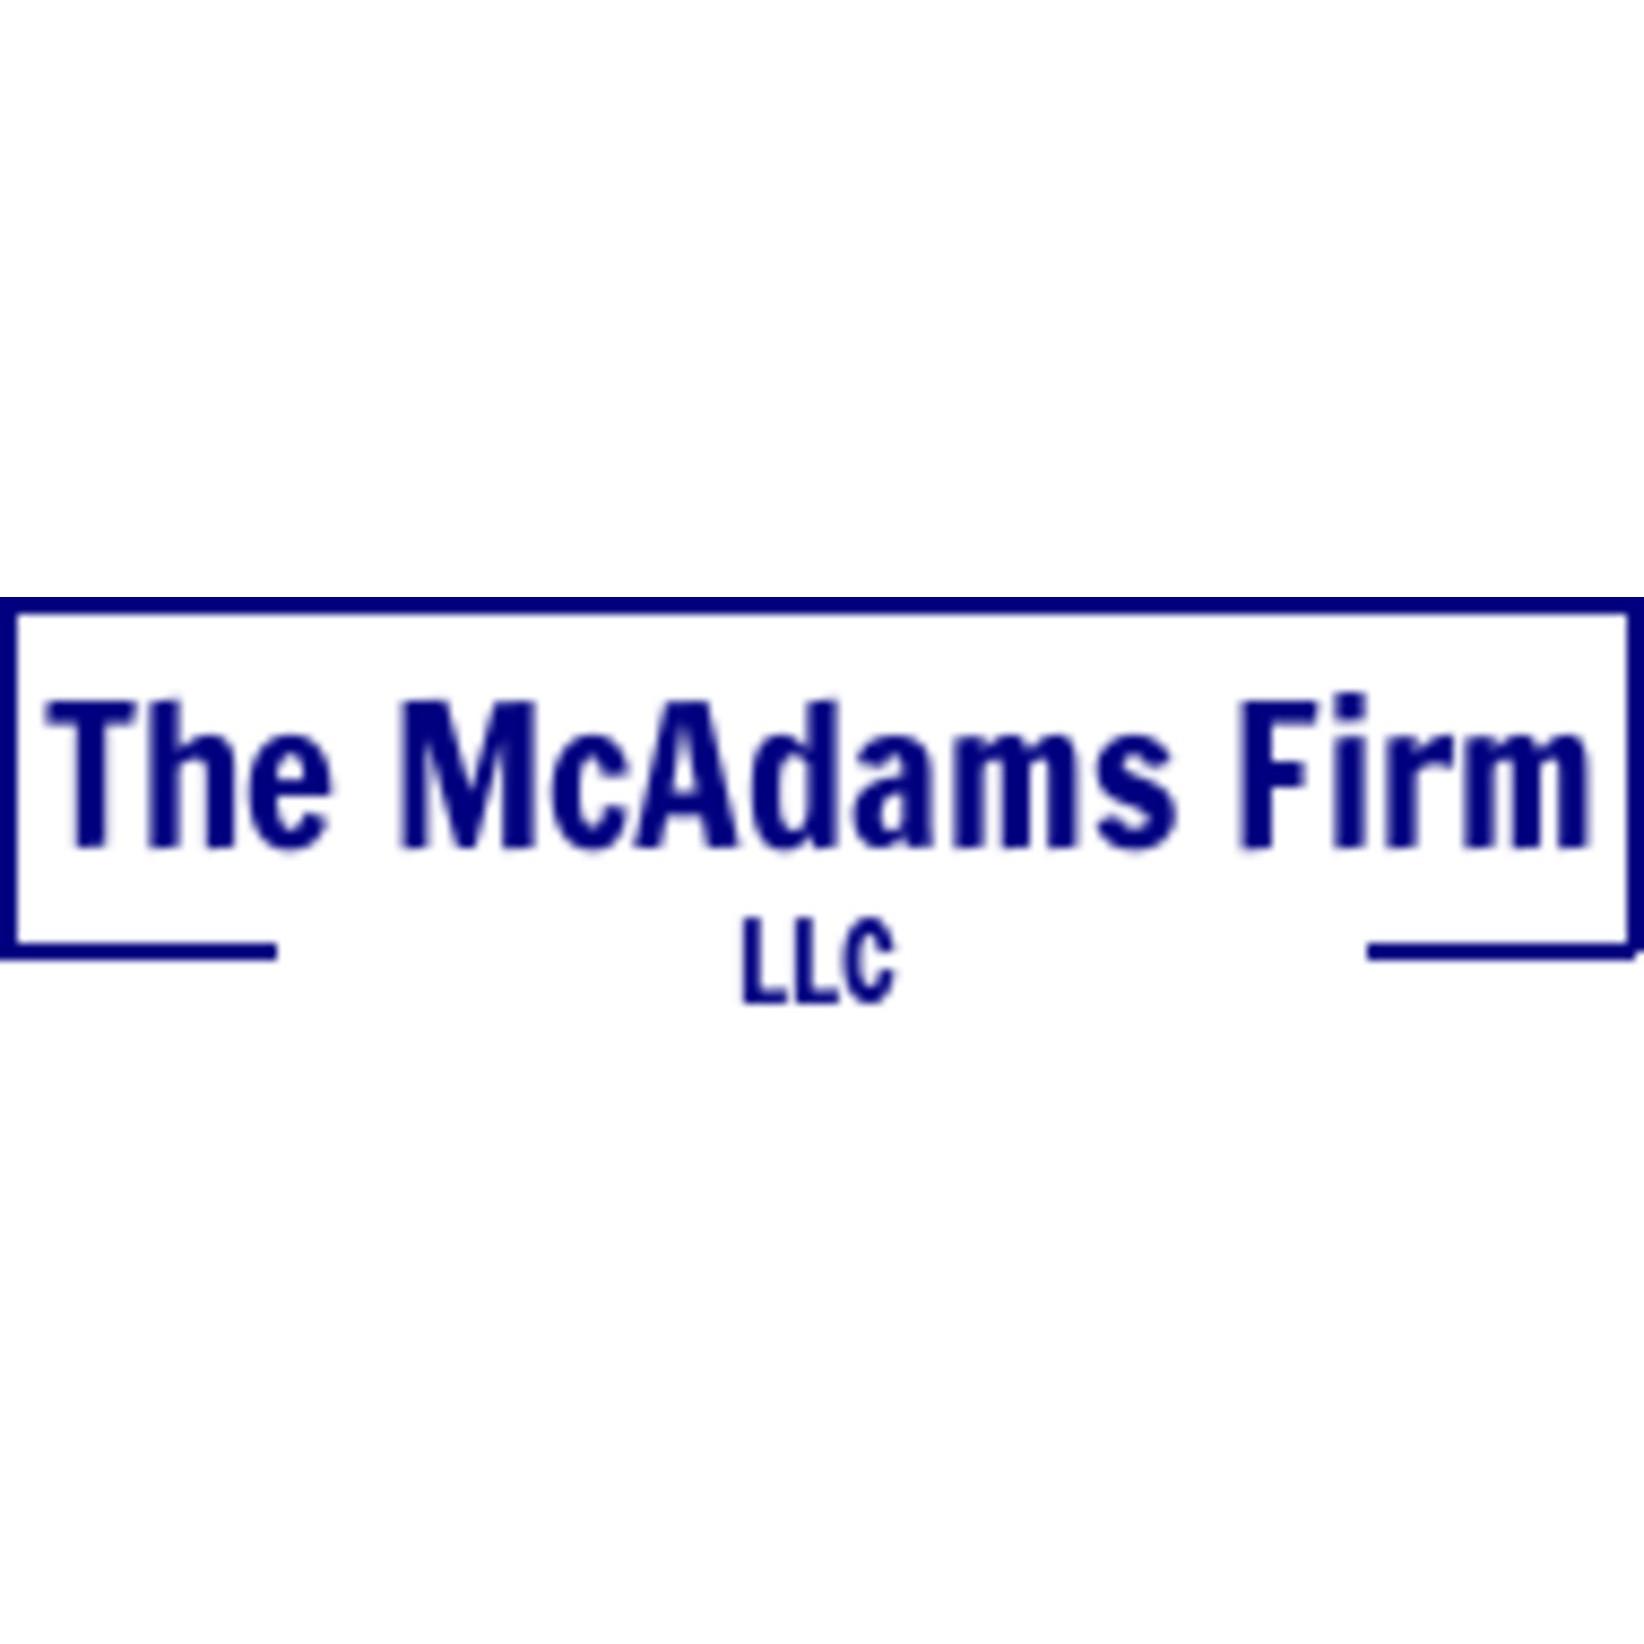 The McAdams Firm, LLC